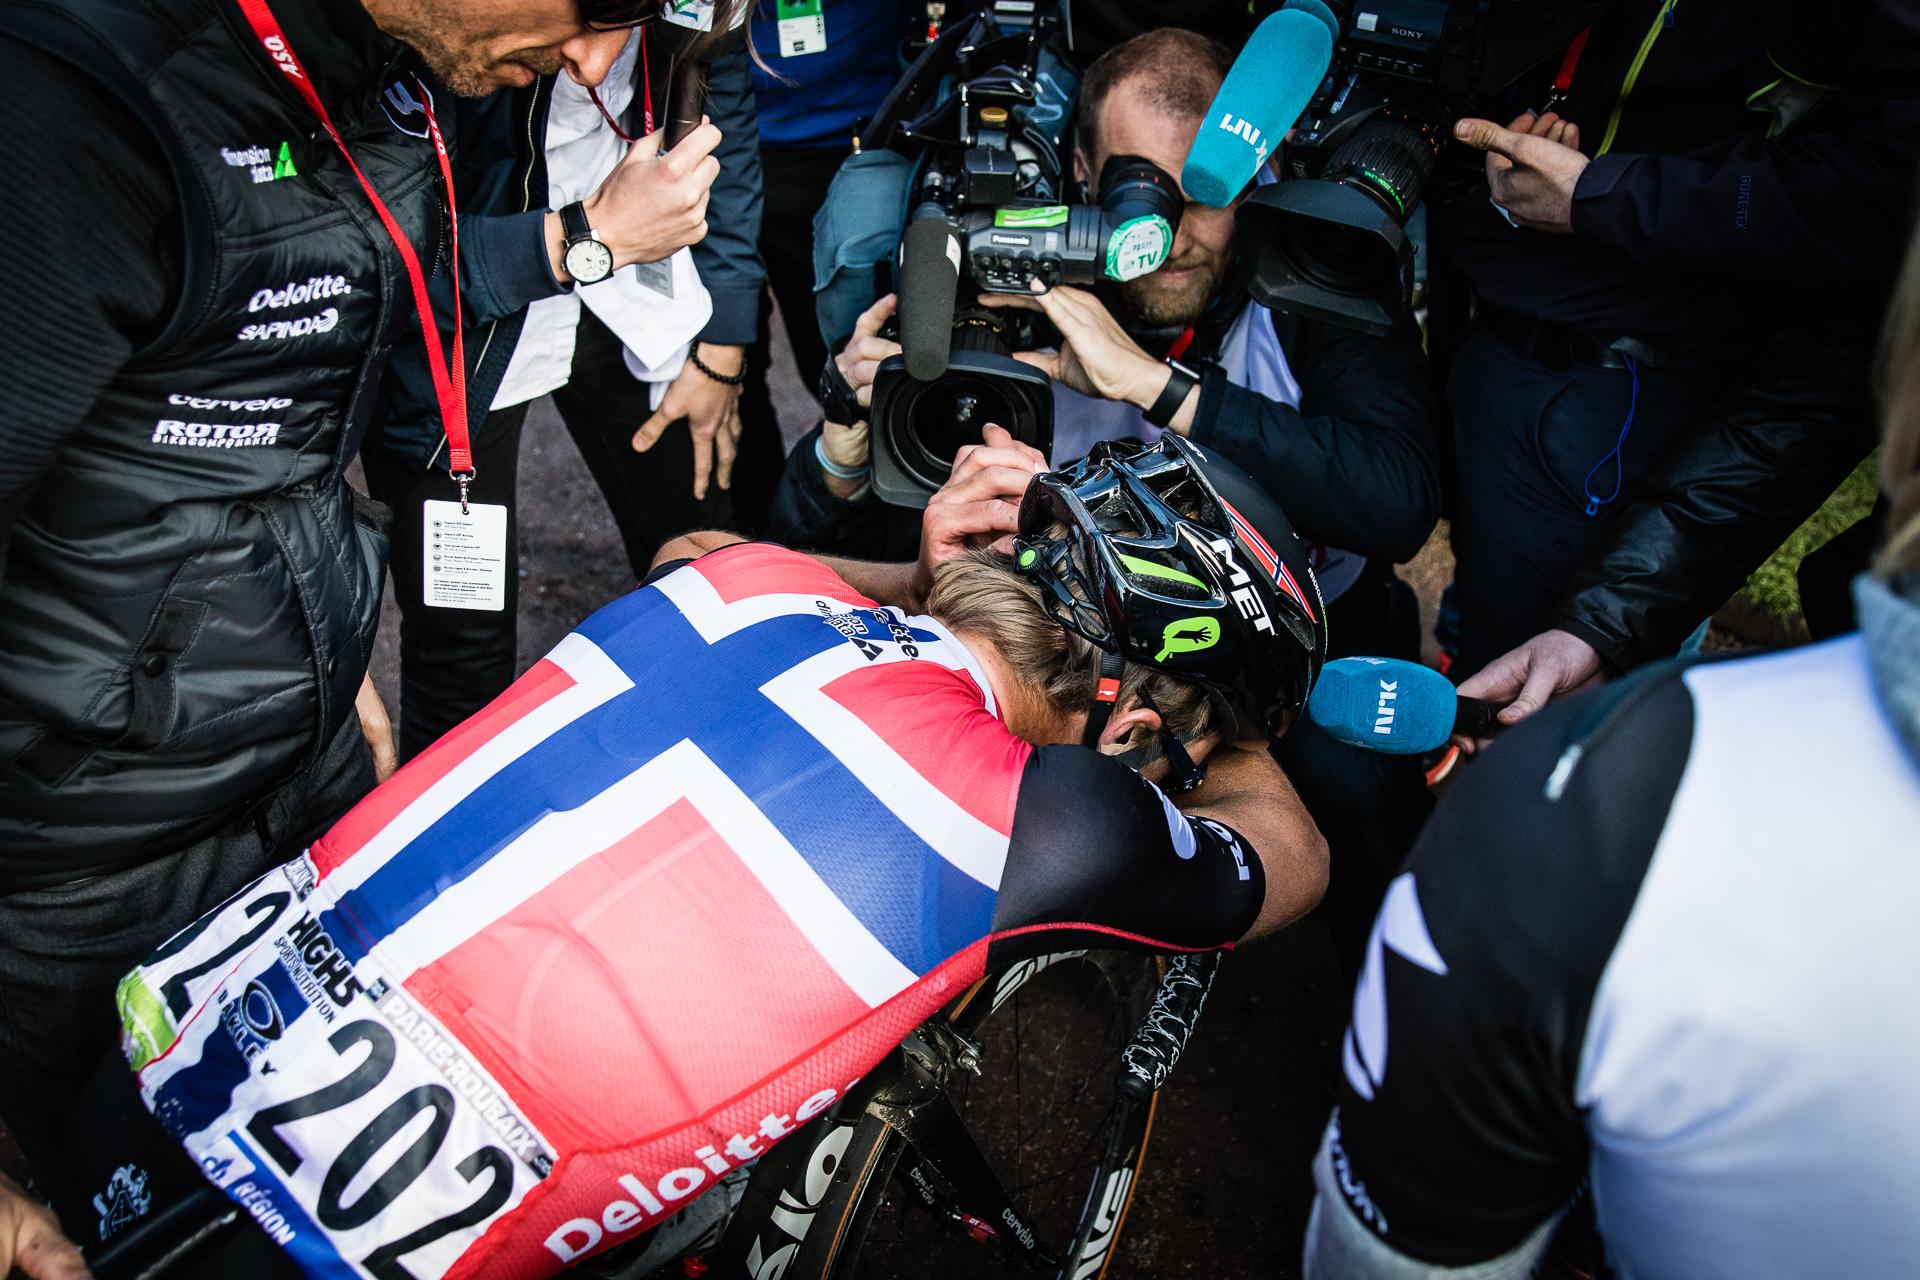 Edvald Boasson Hagen Roubaix